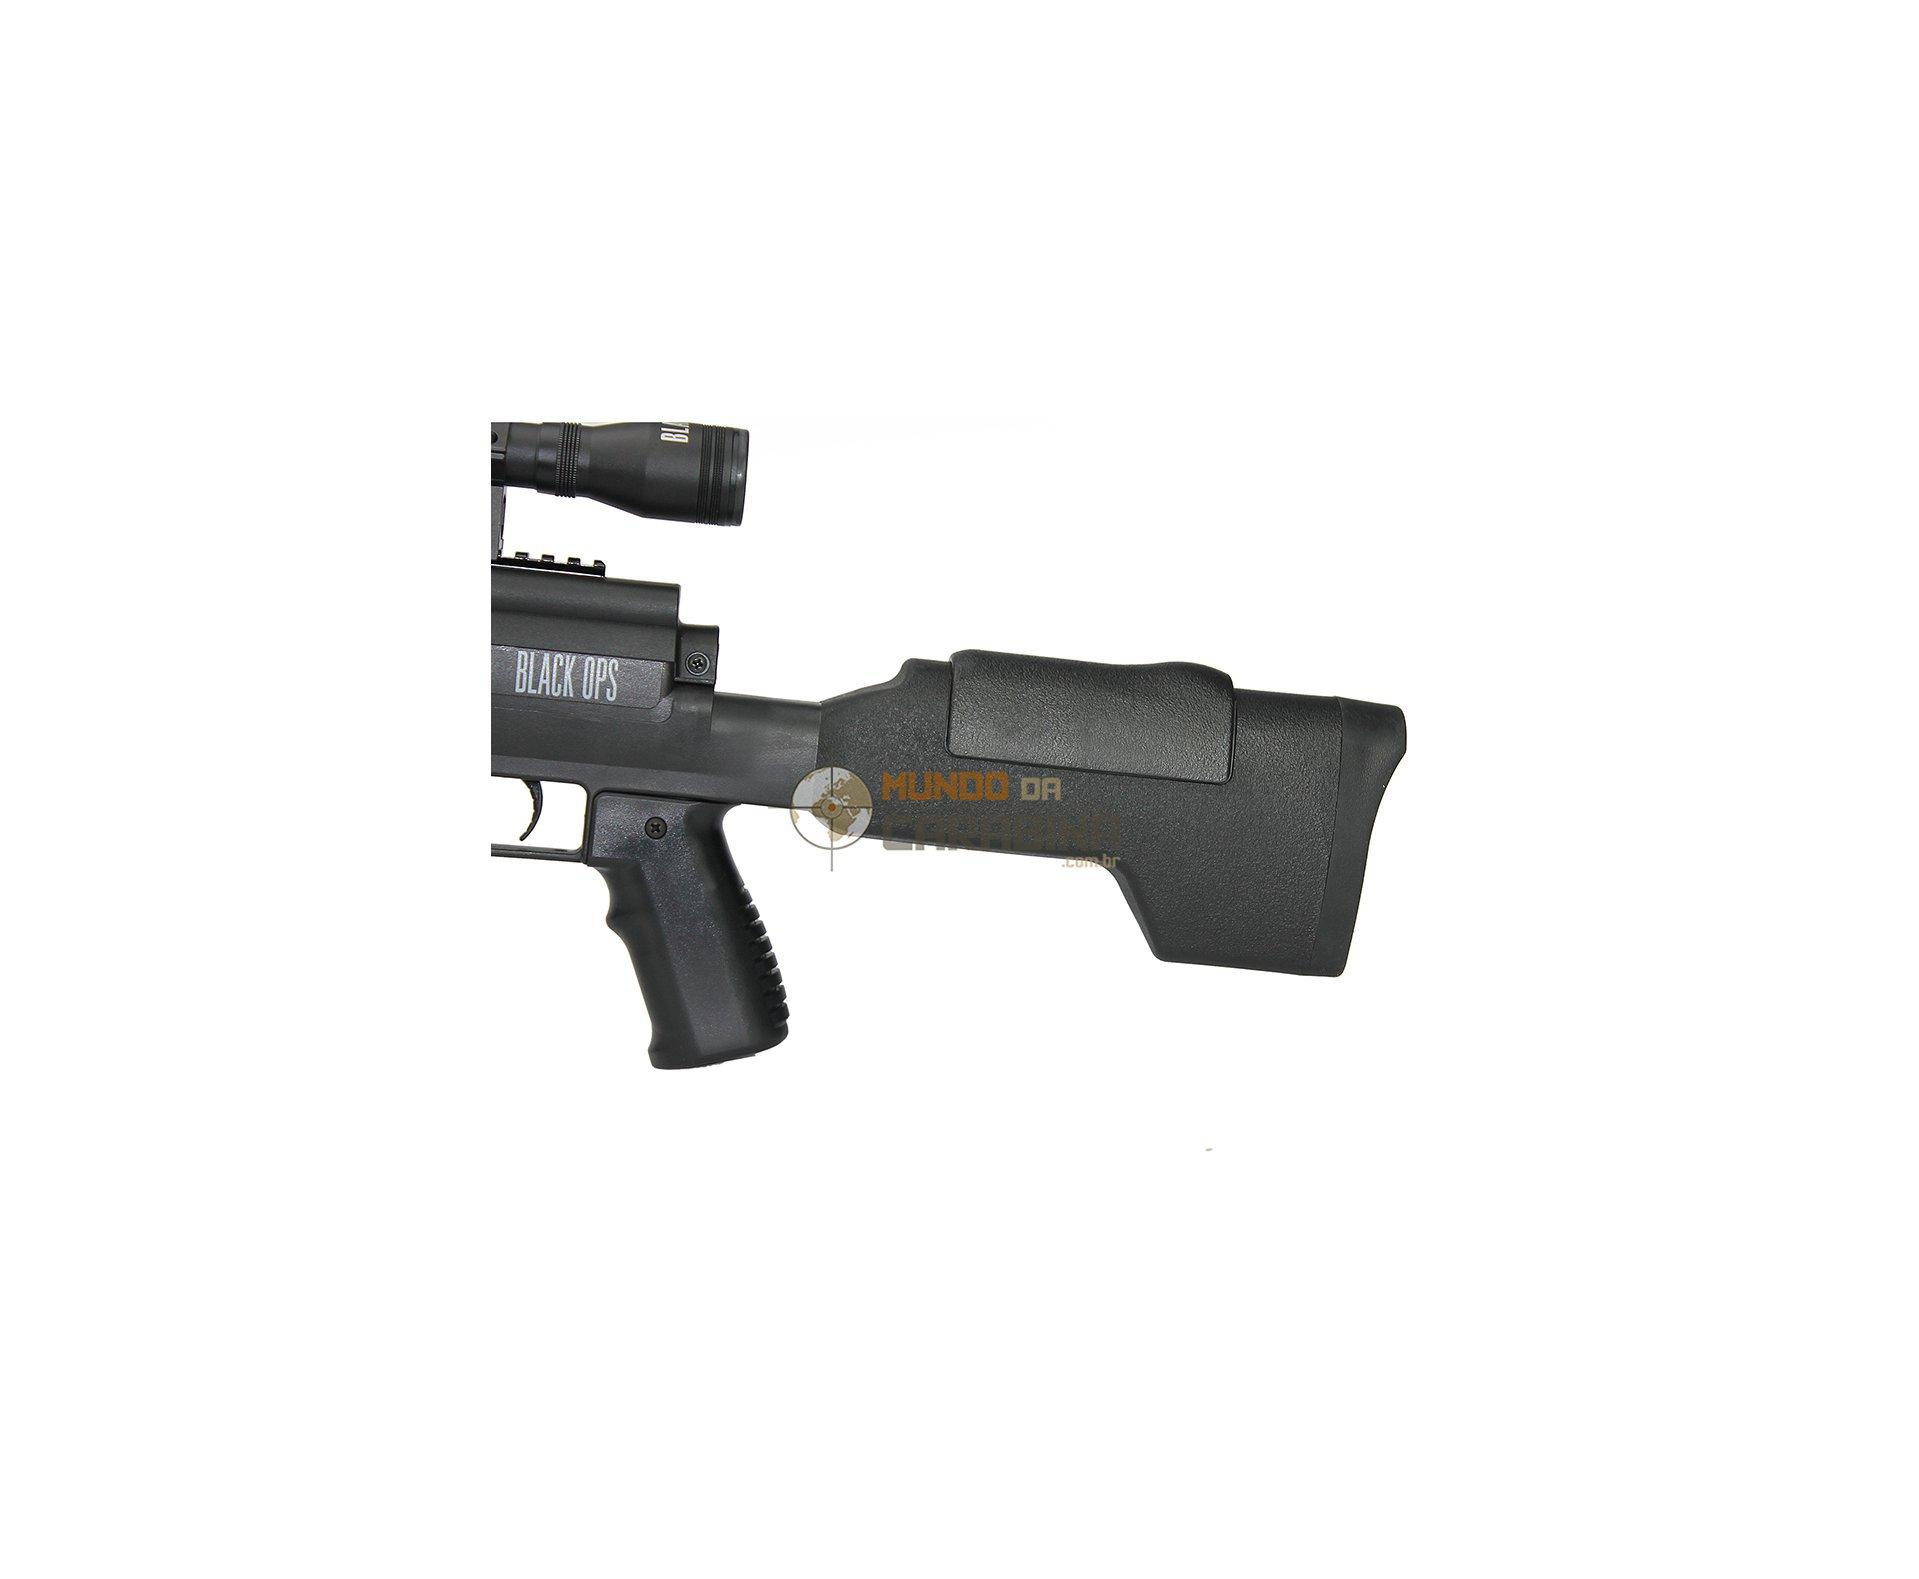 Carabina De Pressão Sniper Black Ops Cal 5,5mm Gas Ram 60kg Rossi + Luneta 4x32